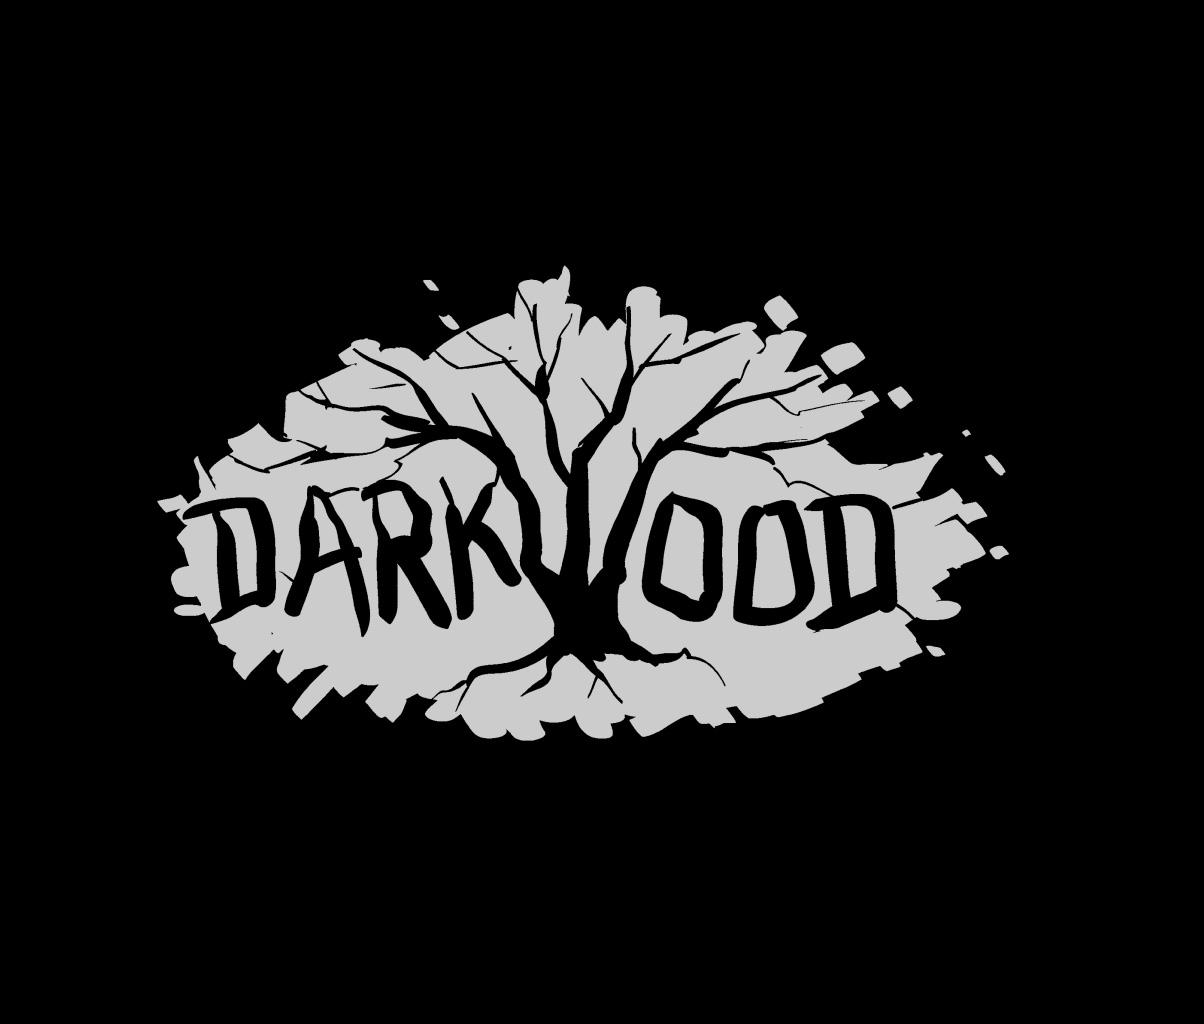 Darkwood commercial